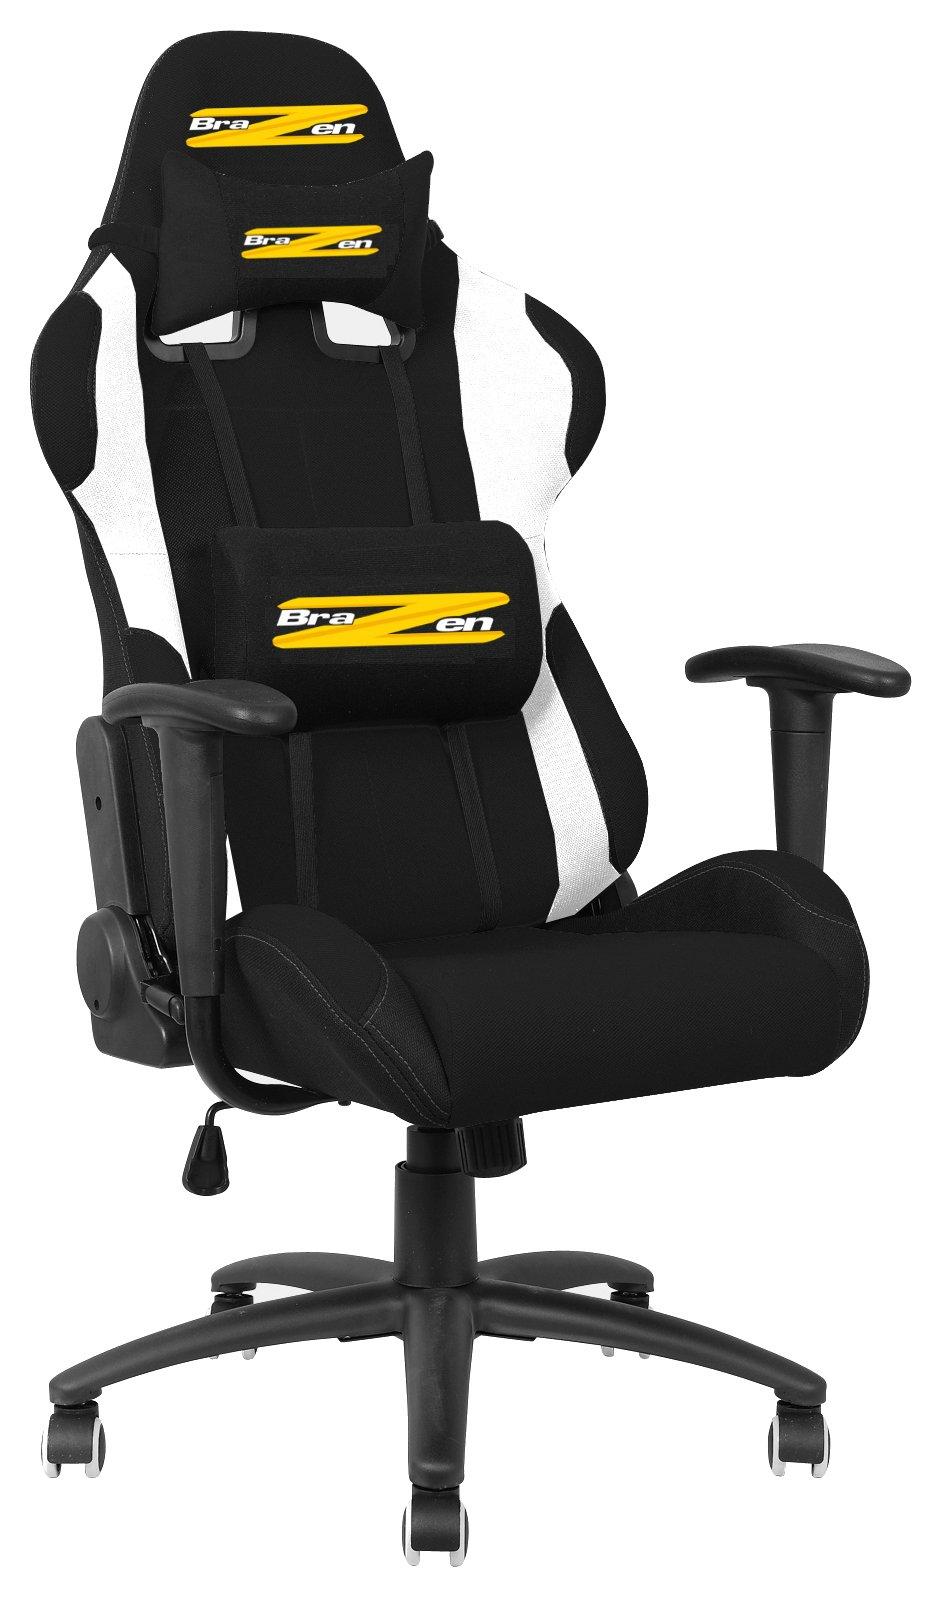 Brazen Shadow Pro Gaming Chair Black